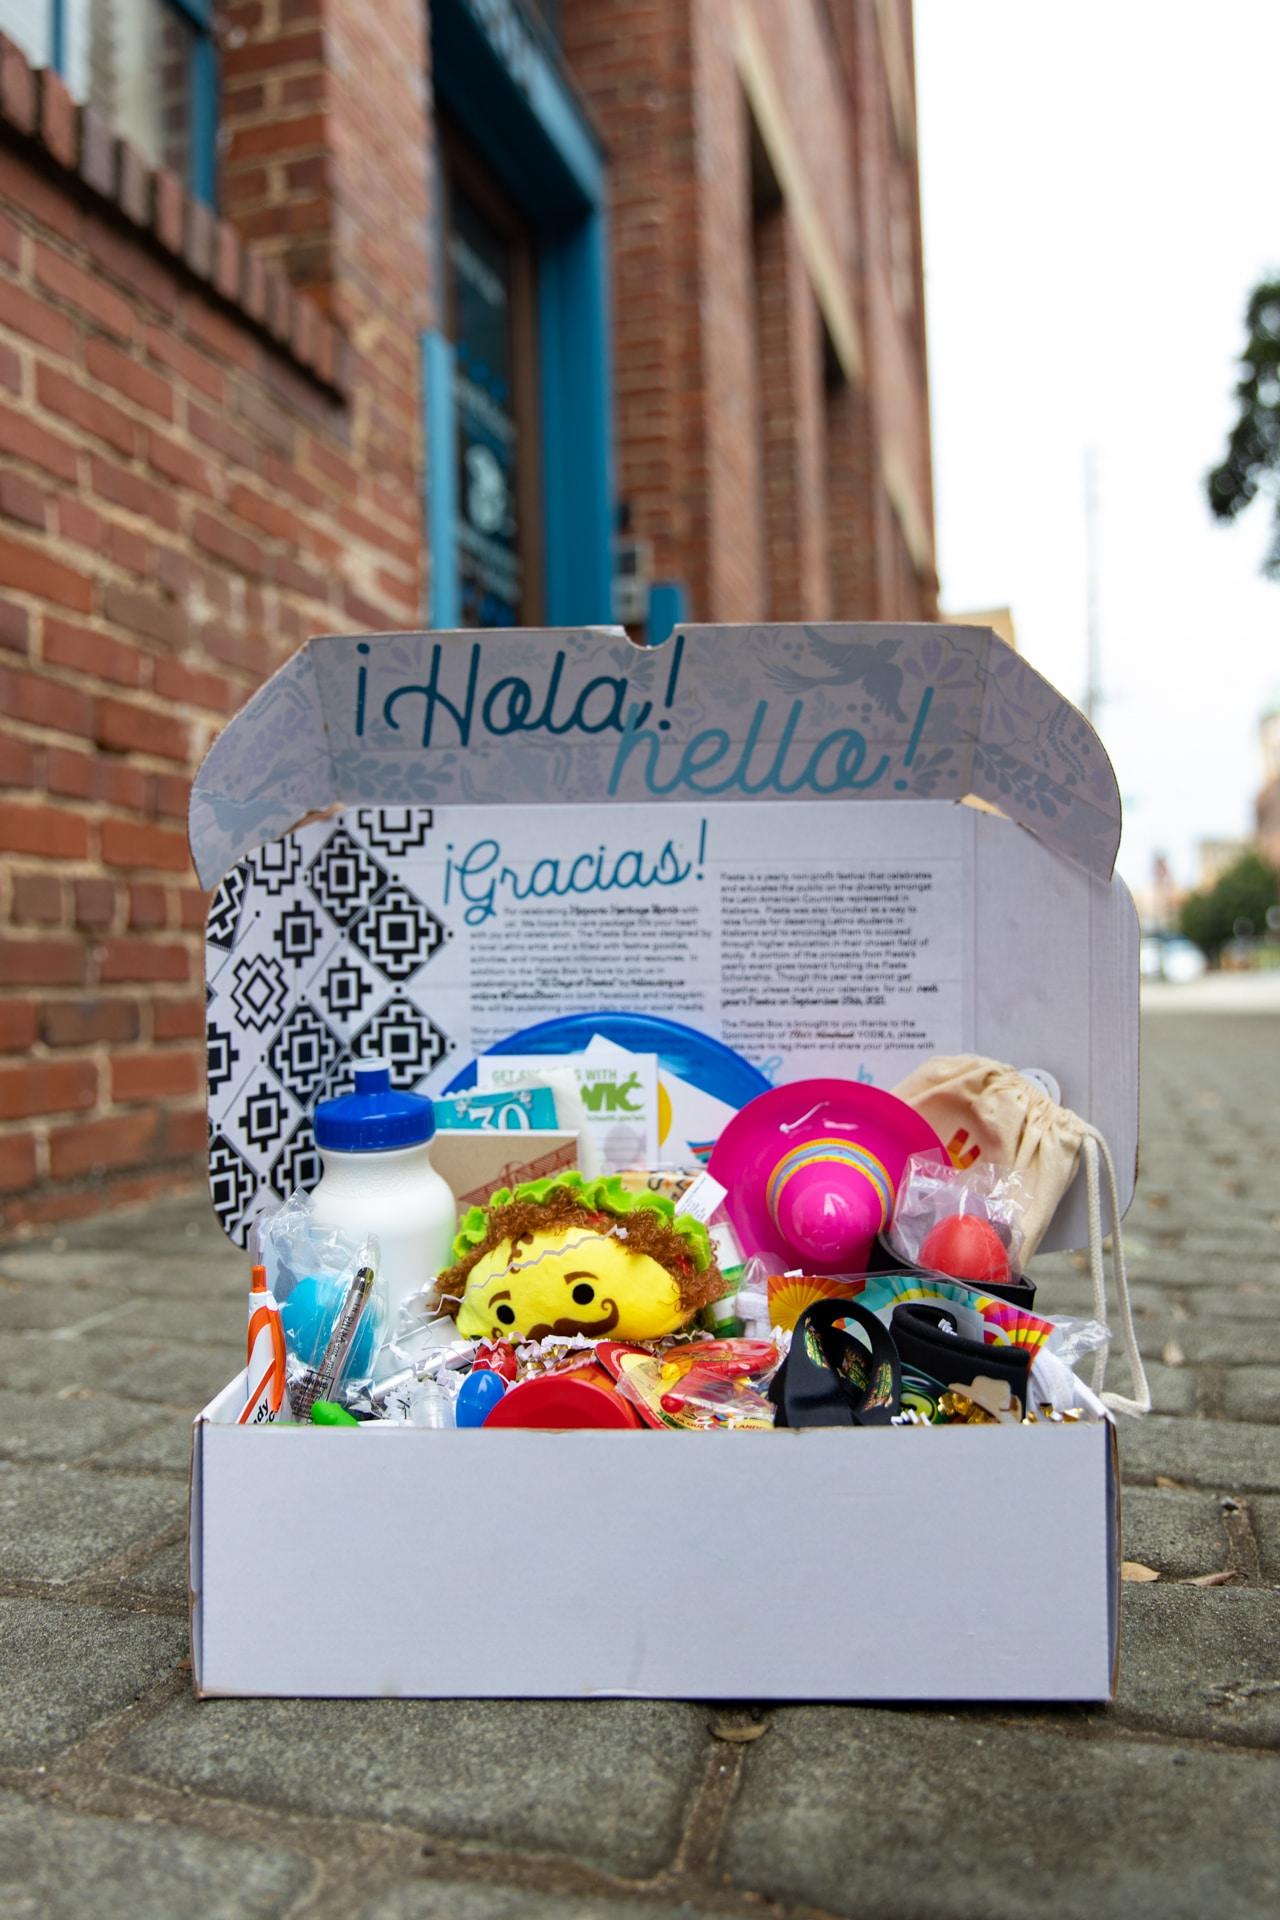 Birmingham, Fiesta Bham, Fiesta, Fiesta in a Box